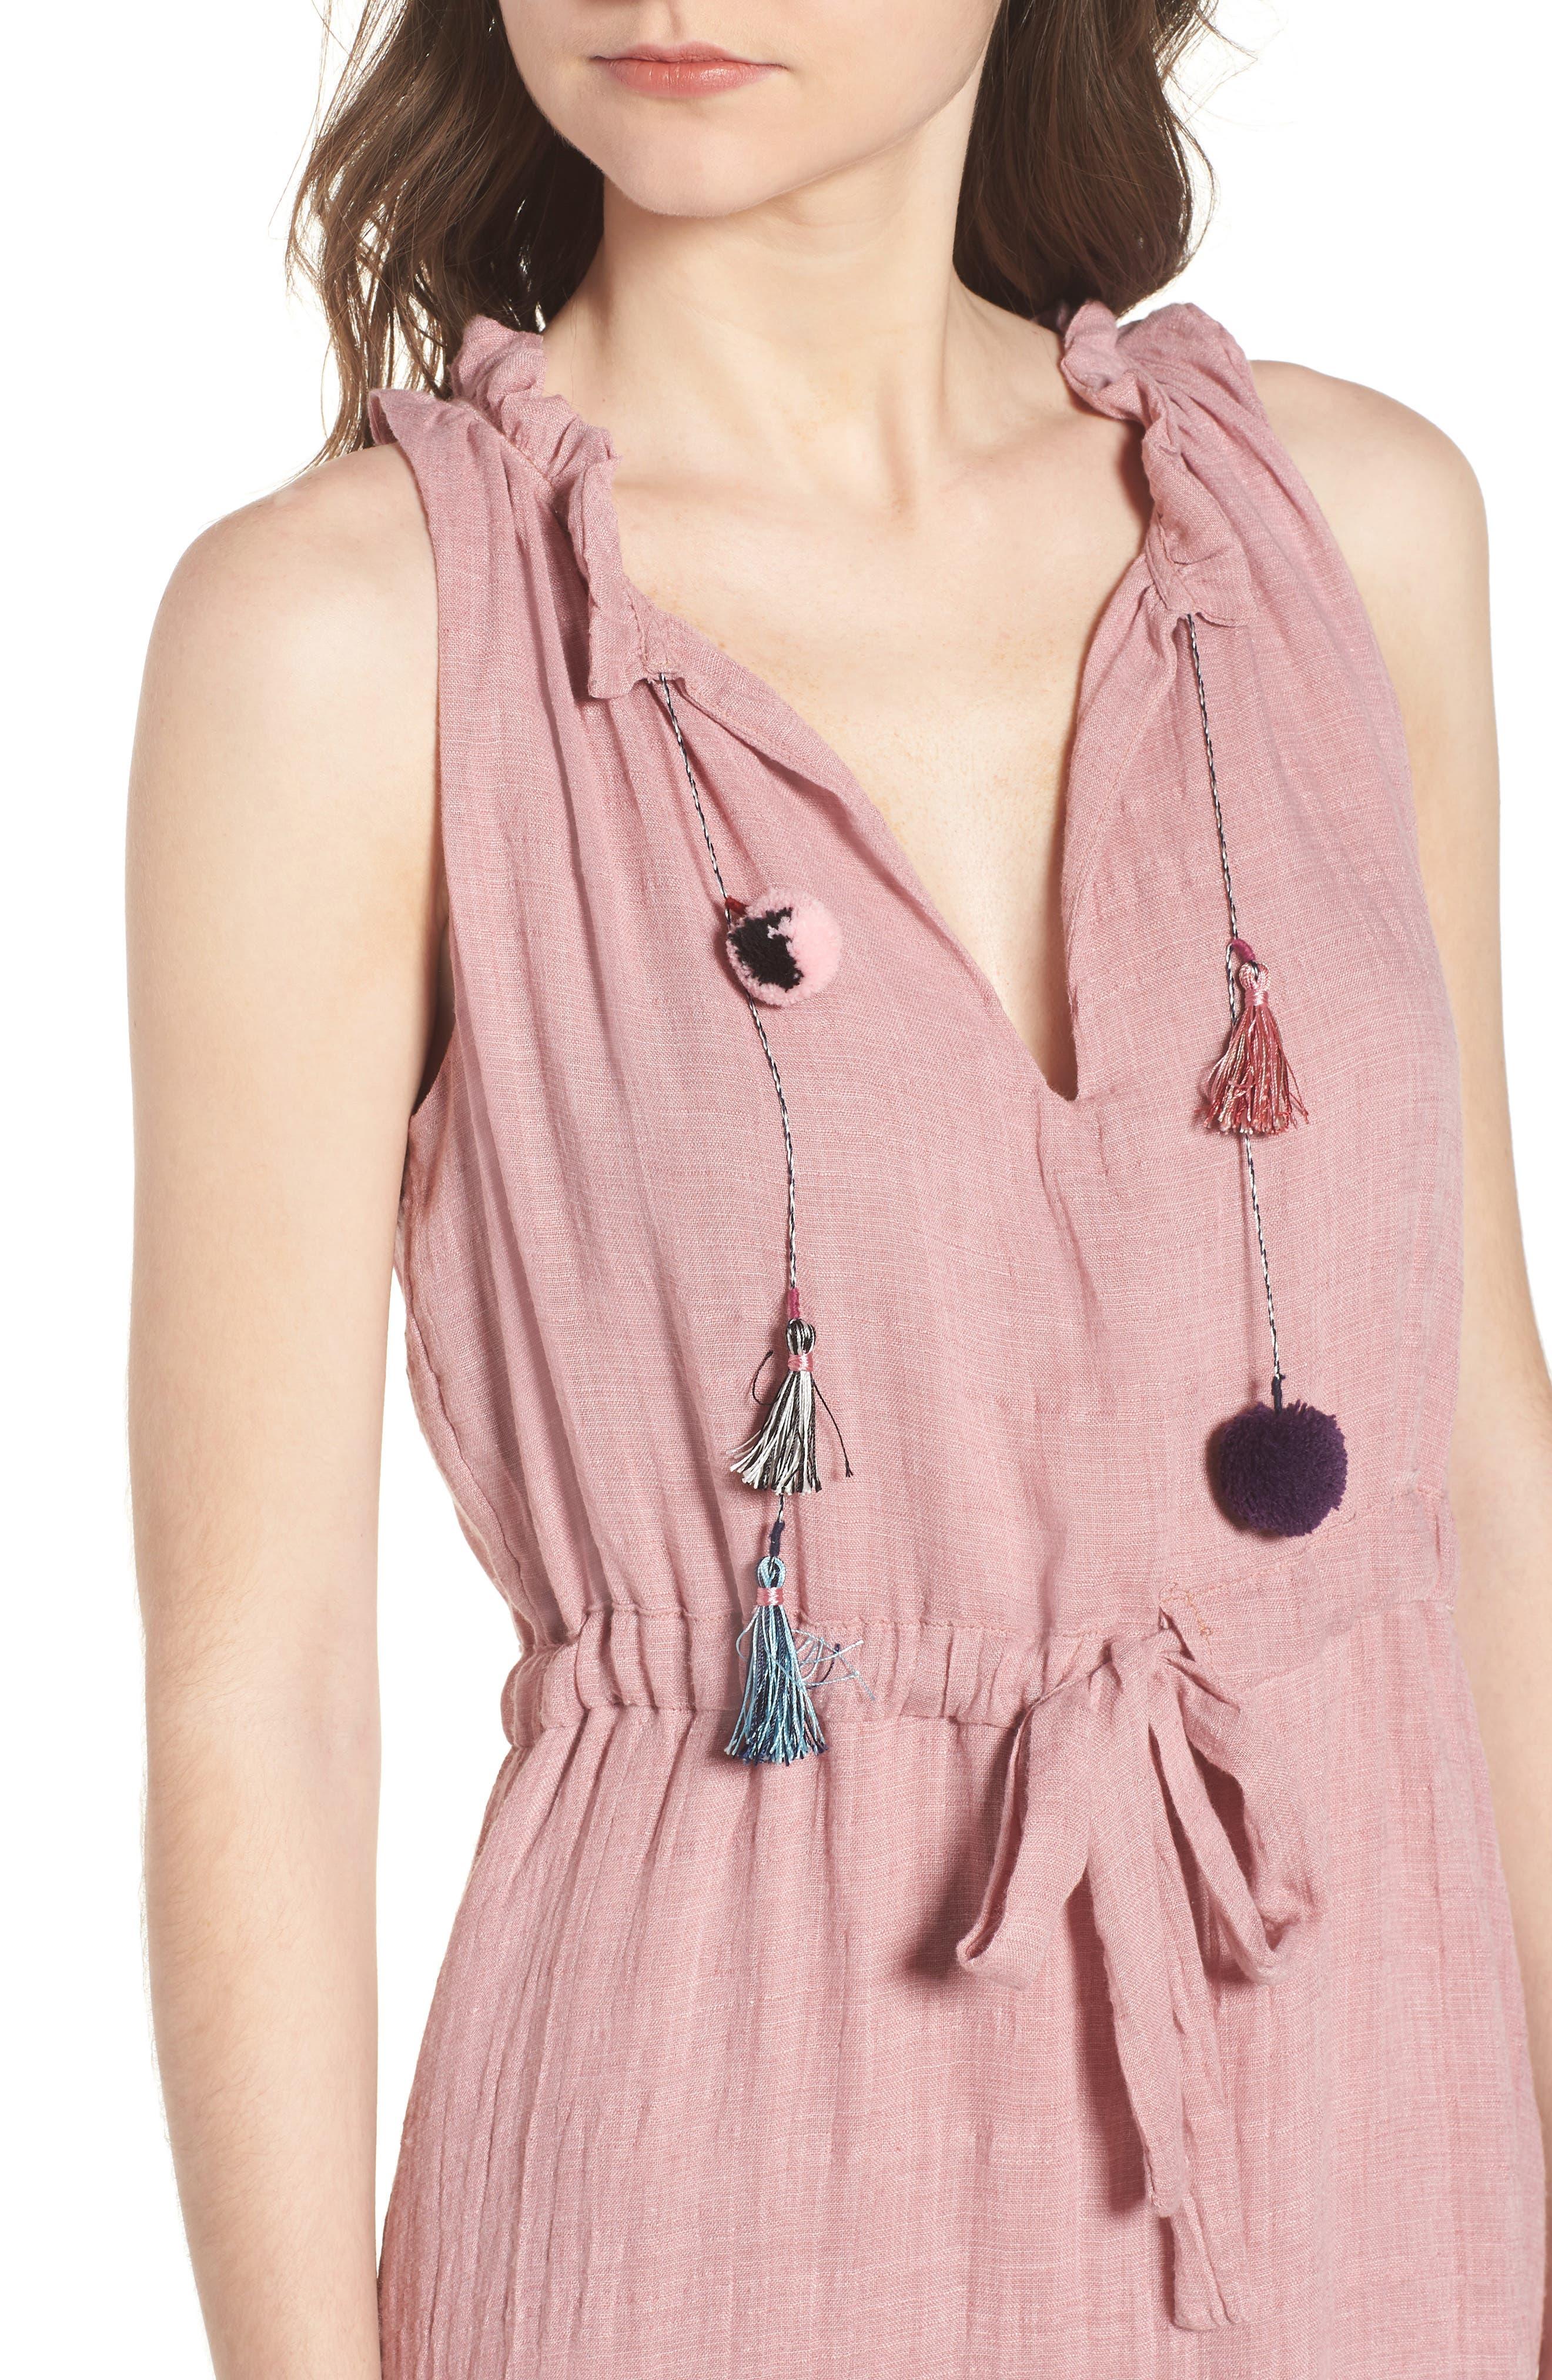 Nicolleta Tie Waist Midi Dress,                             Alternate thumbnail 4, color,                             650